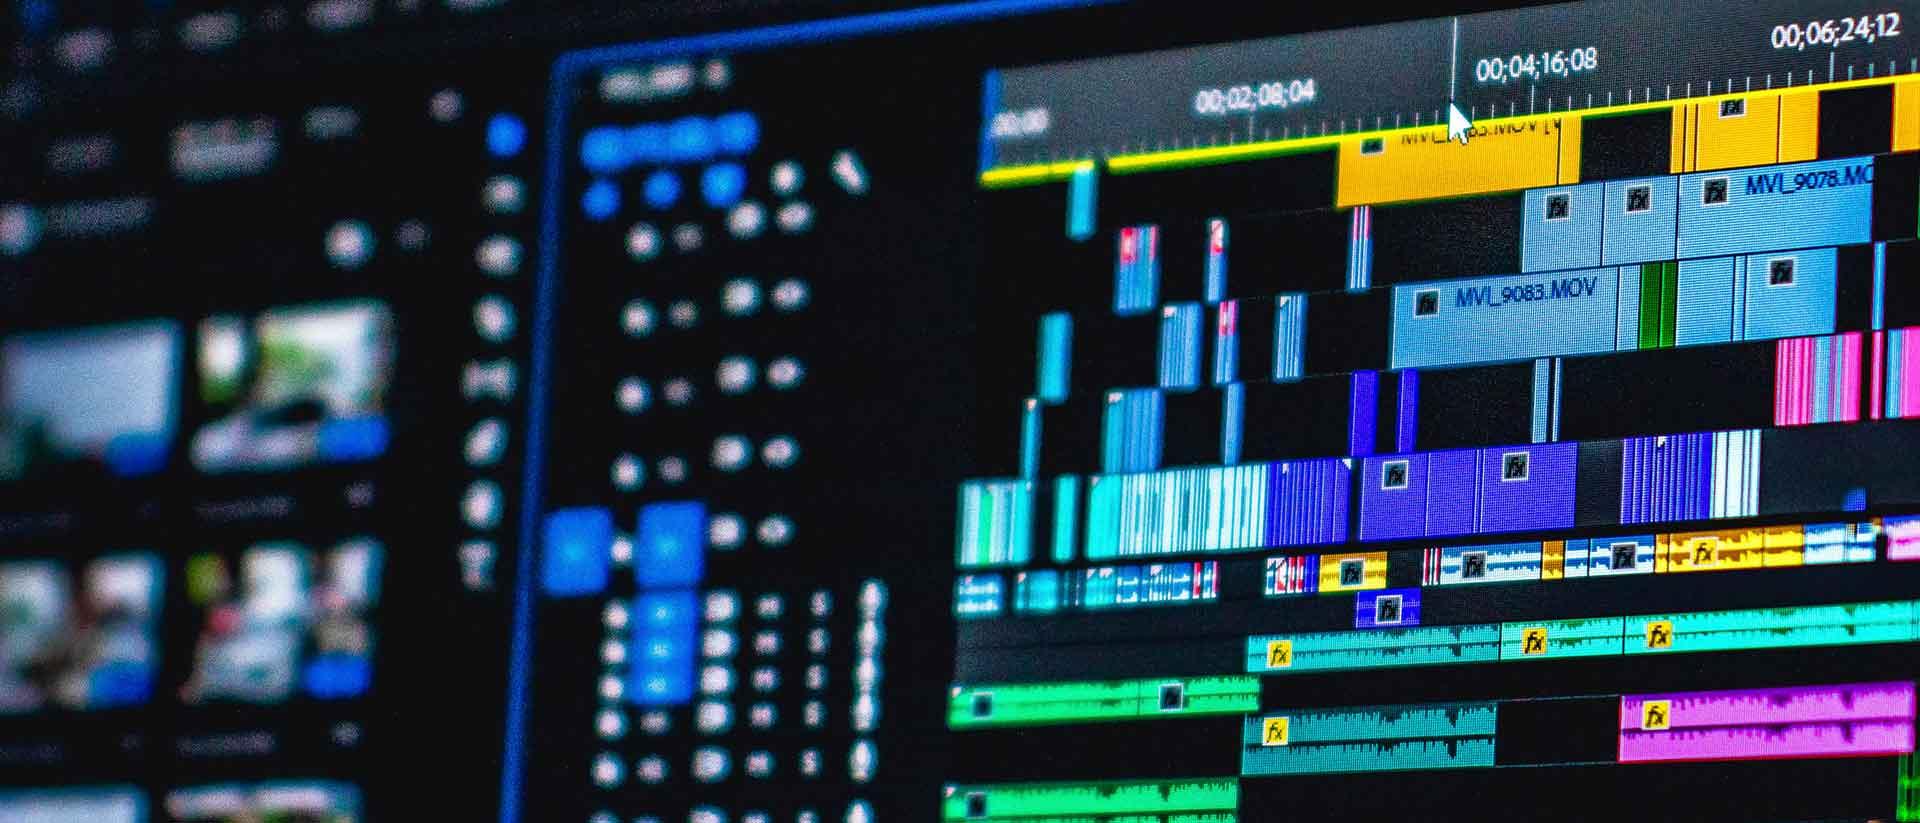 6 premiere pro vfx hacks that you should know about blog banner